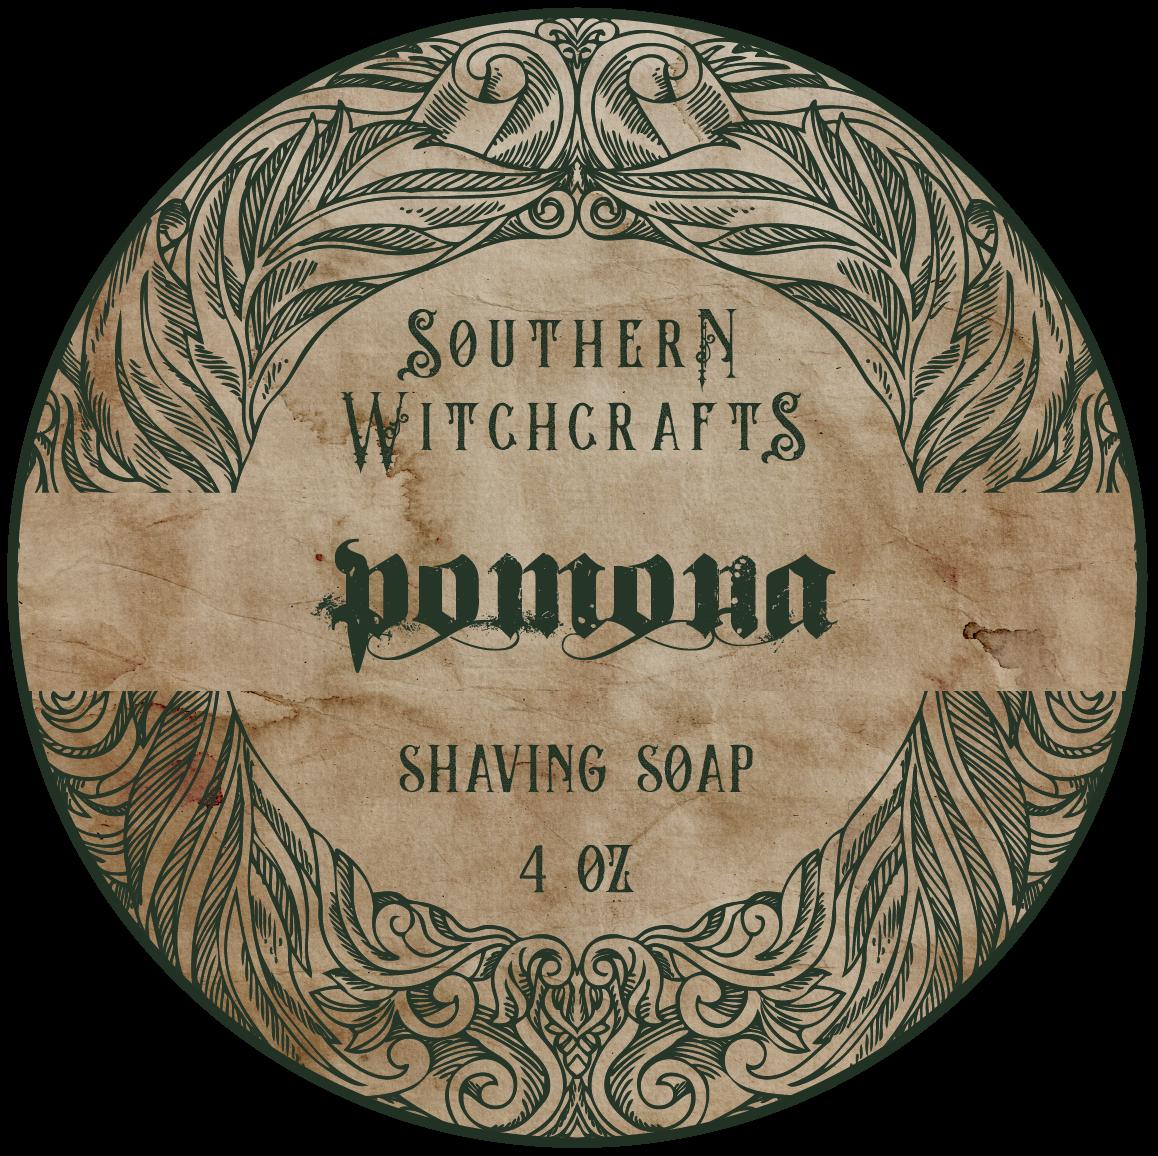 Southern Witchcrafts - Pomona - Soap (Vegan) image